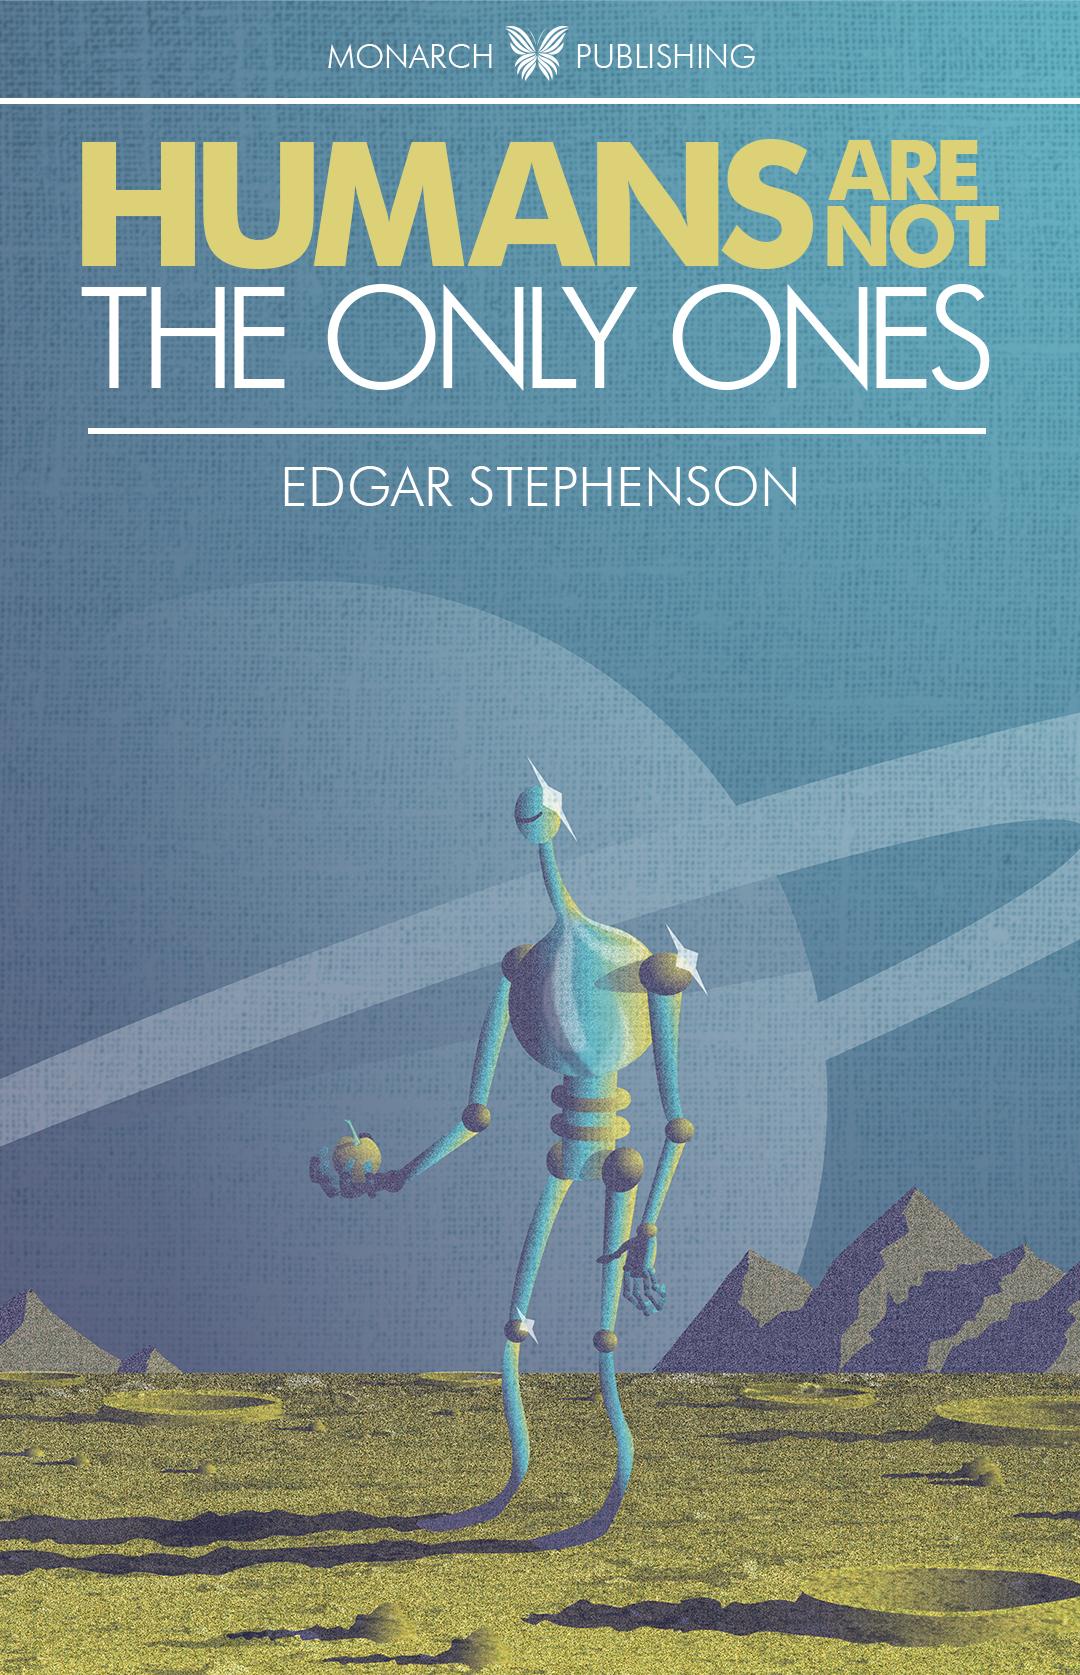 Kyle-Dolan-Graphic-Design-Illustration-Branding-Brand-Strategy-Book-Cover-HumansAreNotTheOnlyOnes.jpg